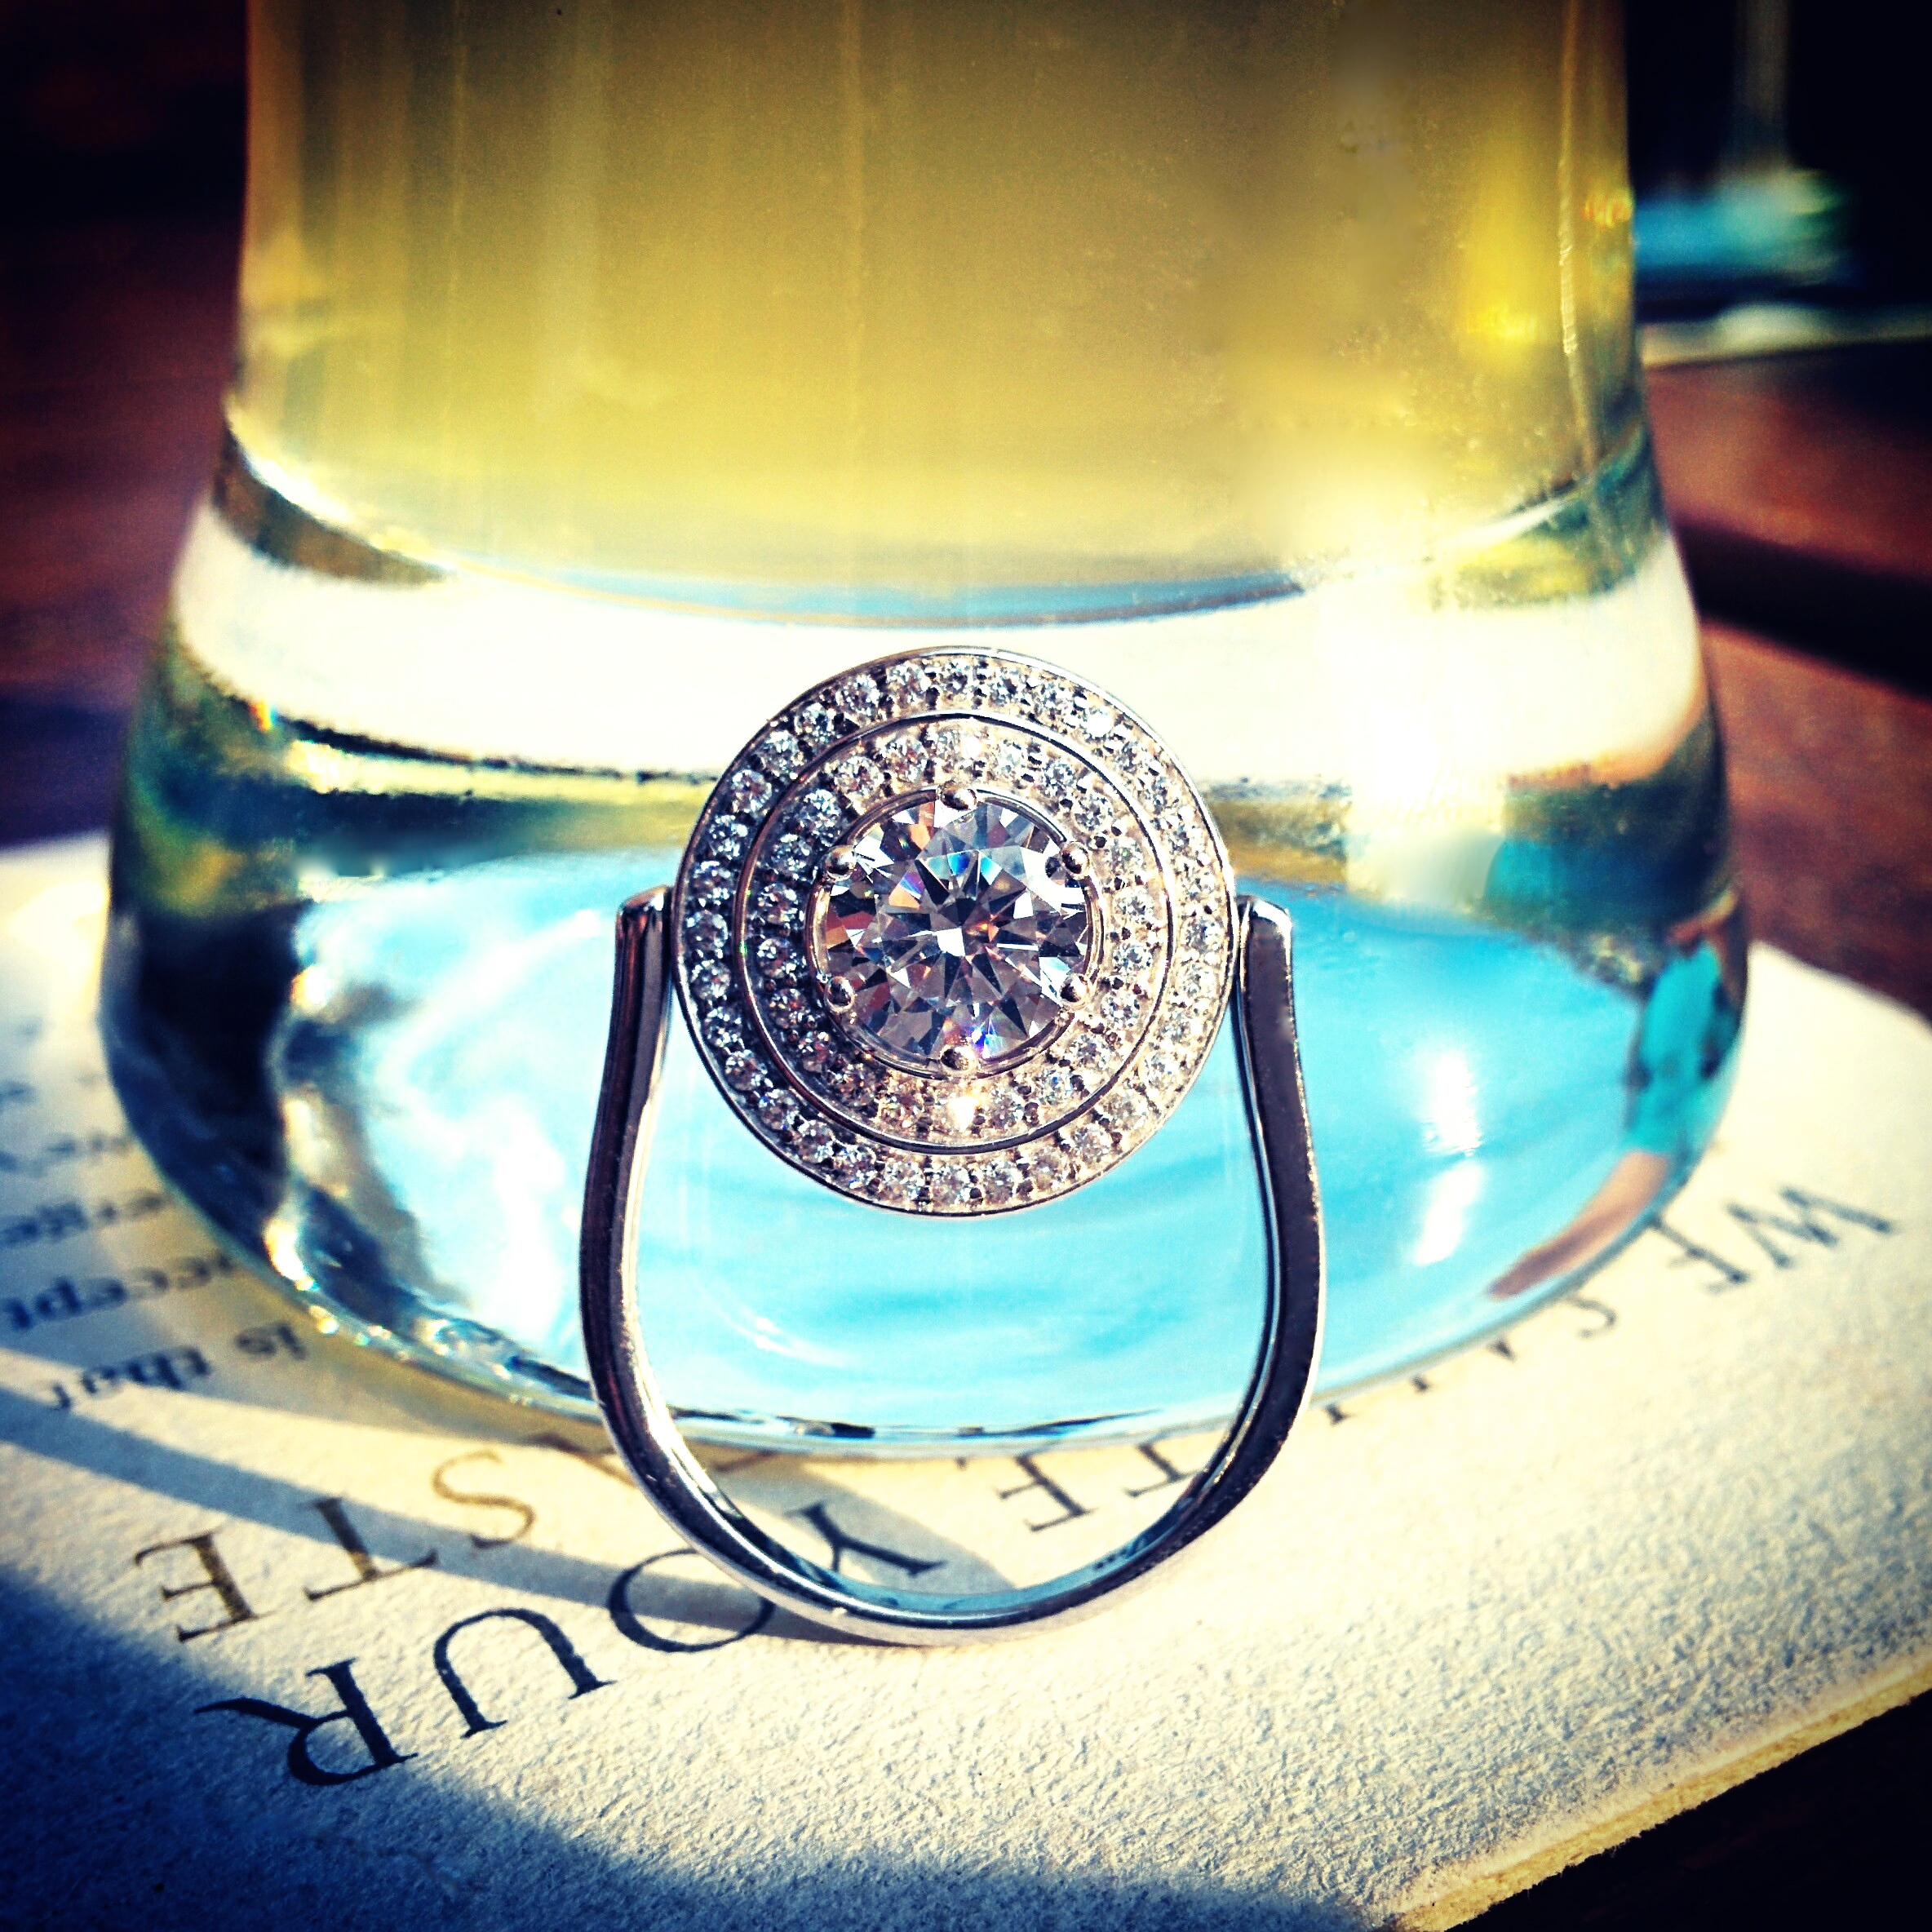 Colourless Passion halo ring_NurtureByReena_Reena Ahluwalia_Lab-Grown Diamonds.jpg